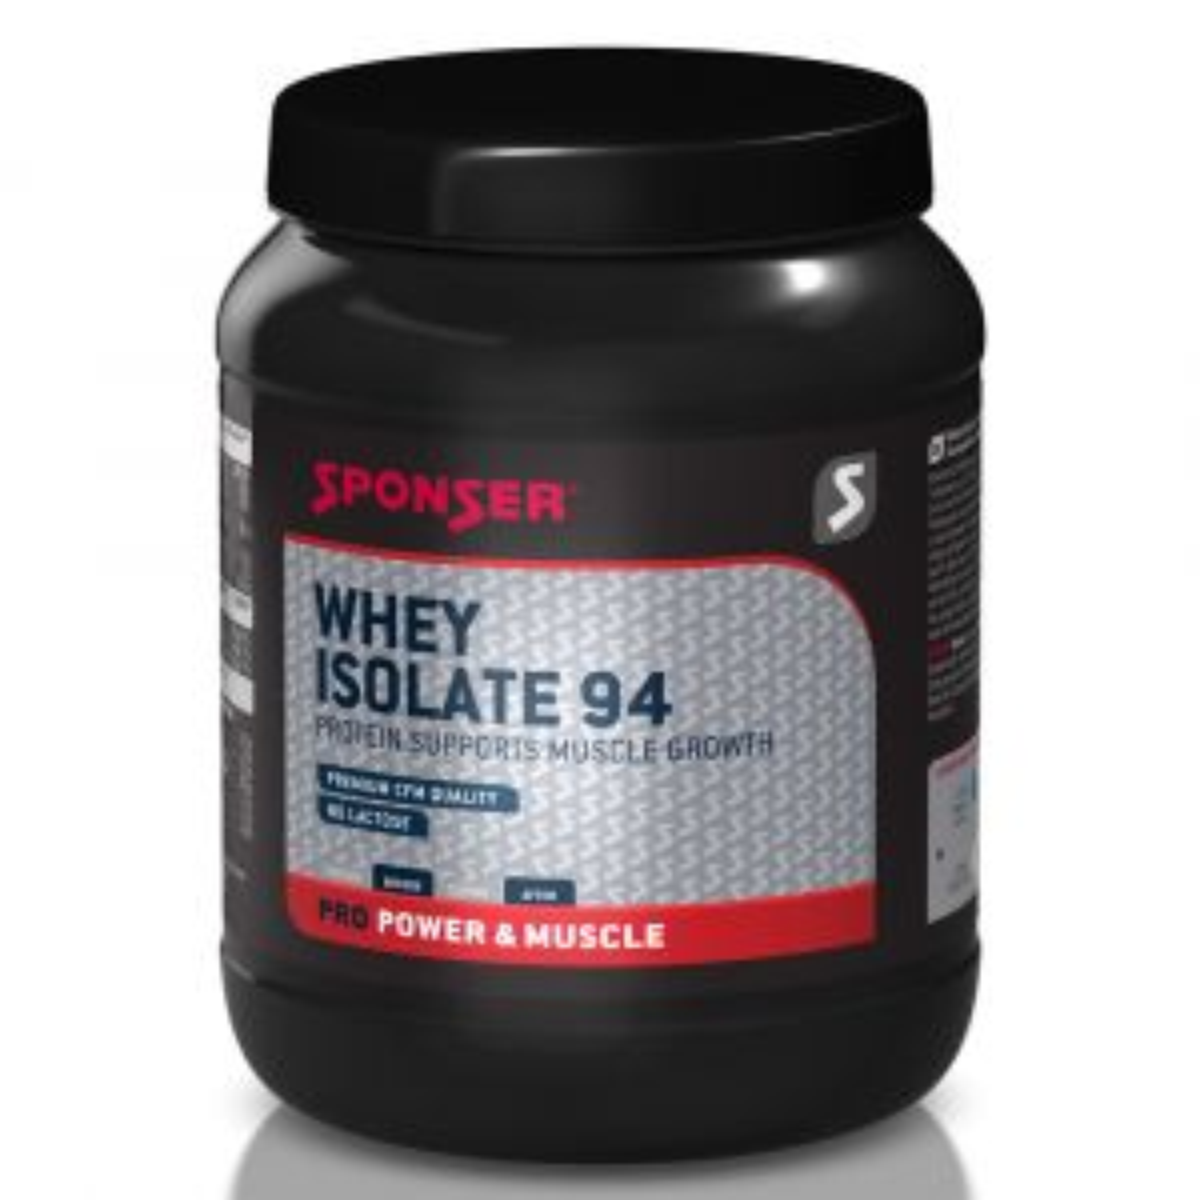 Whey Isolate 94 Molkenproteinisolat Eiweißpulver 425g Joghurt Zitrone - Mindesthaltbarkeitsdatum 09/2021